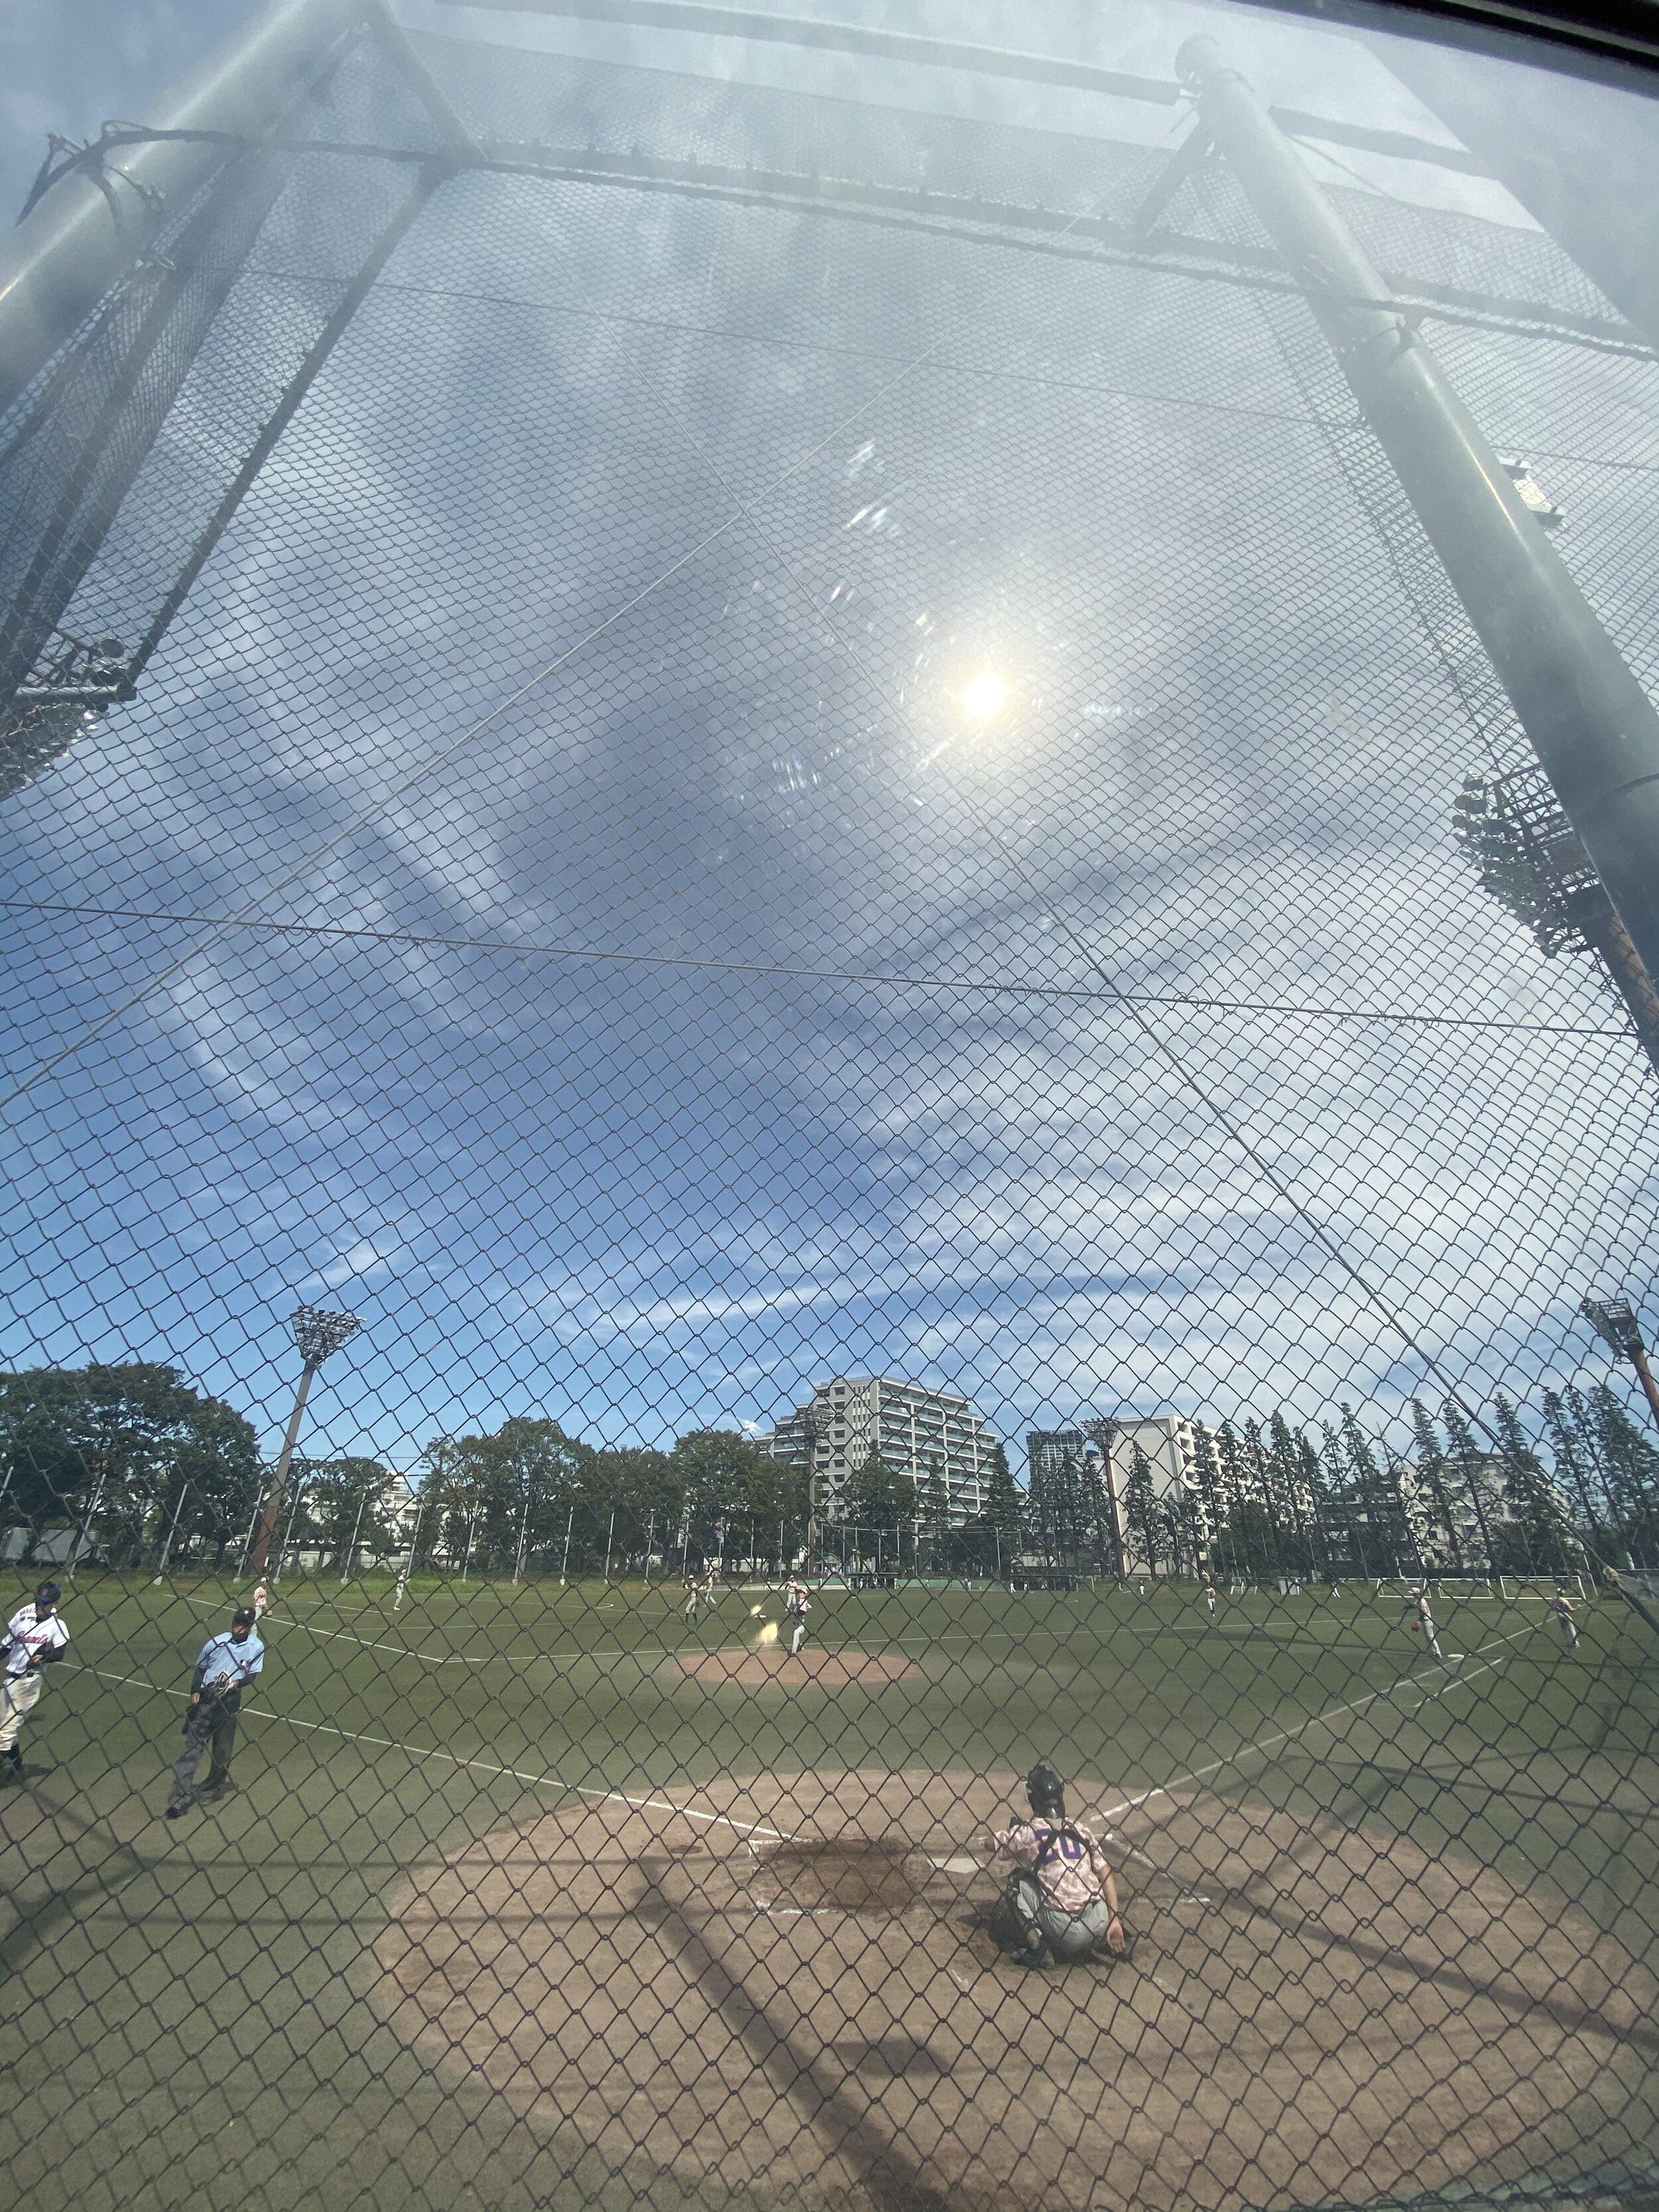 japan baseball field